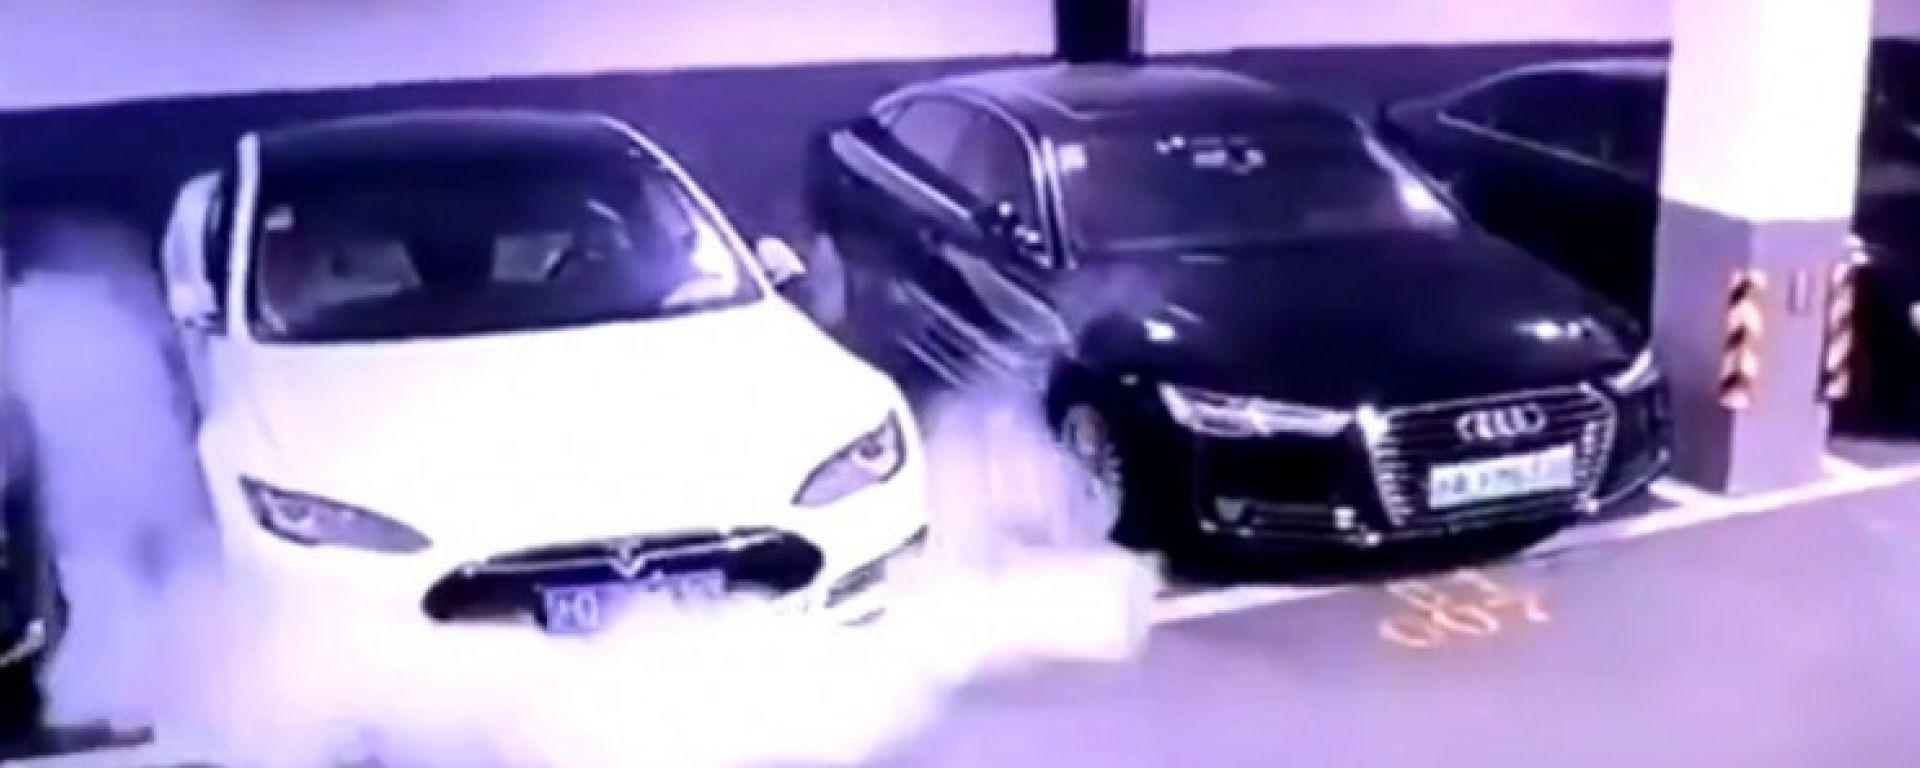 Tesla: Model S in fiamme in Cina, ma guida autonoma nel 2020